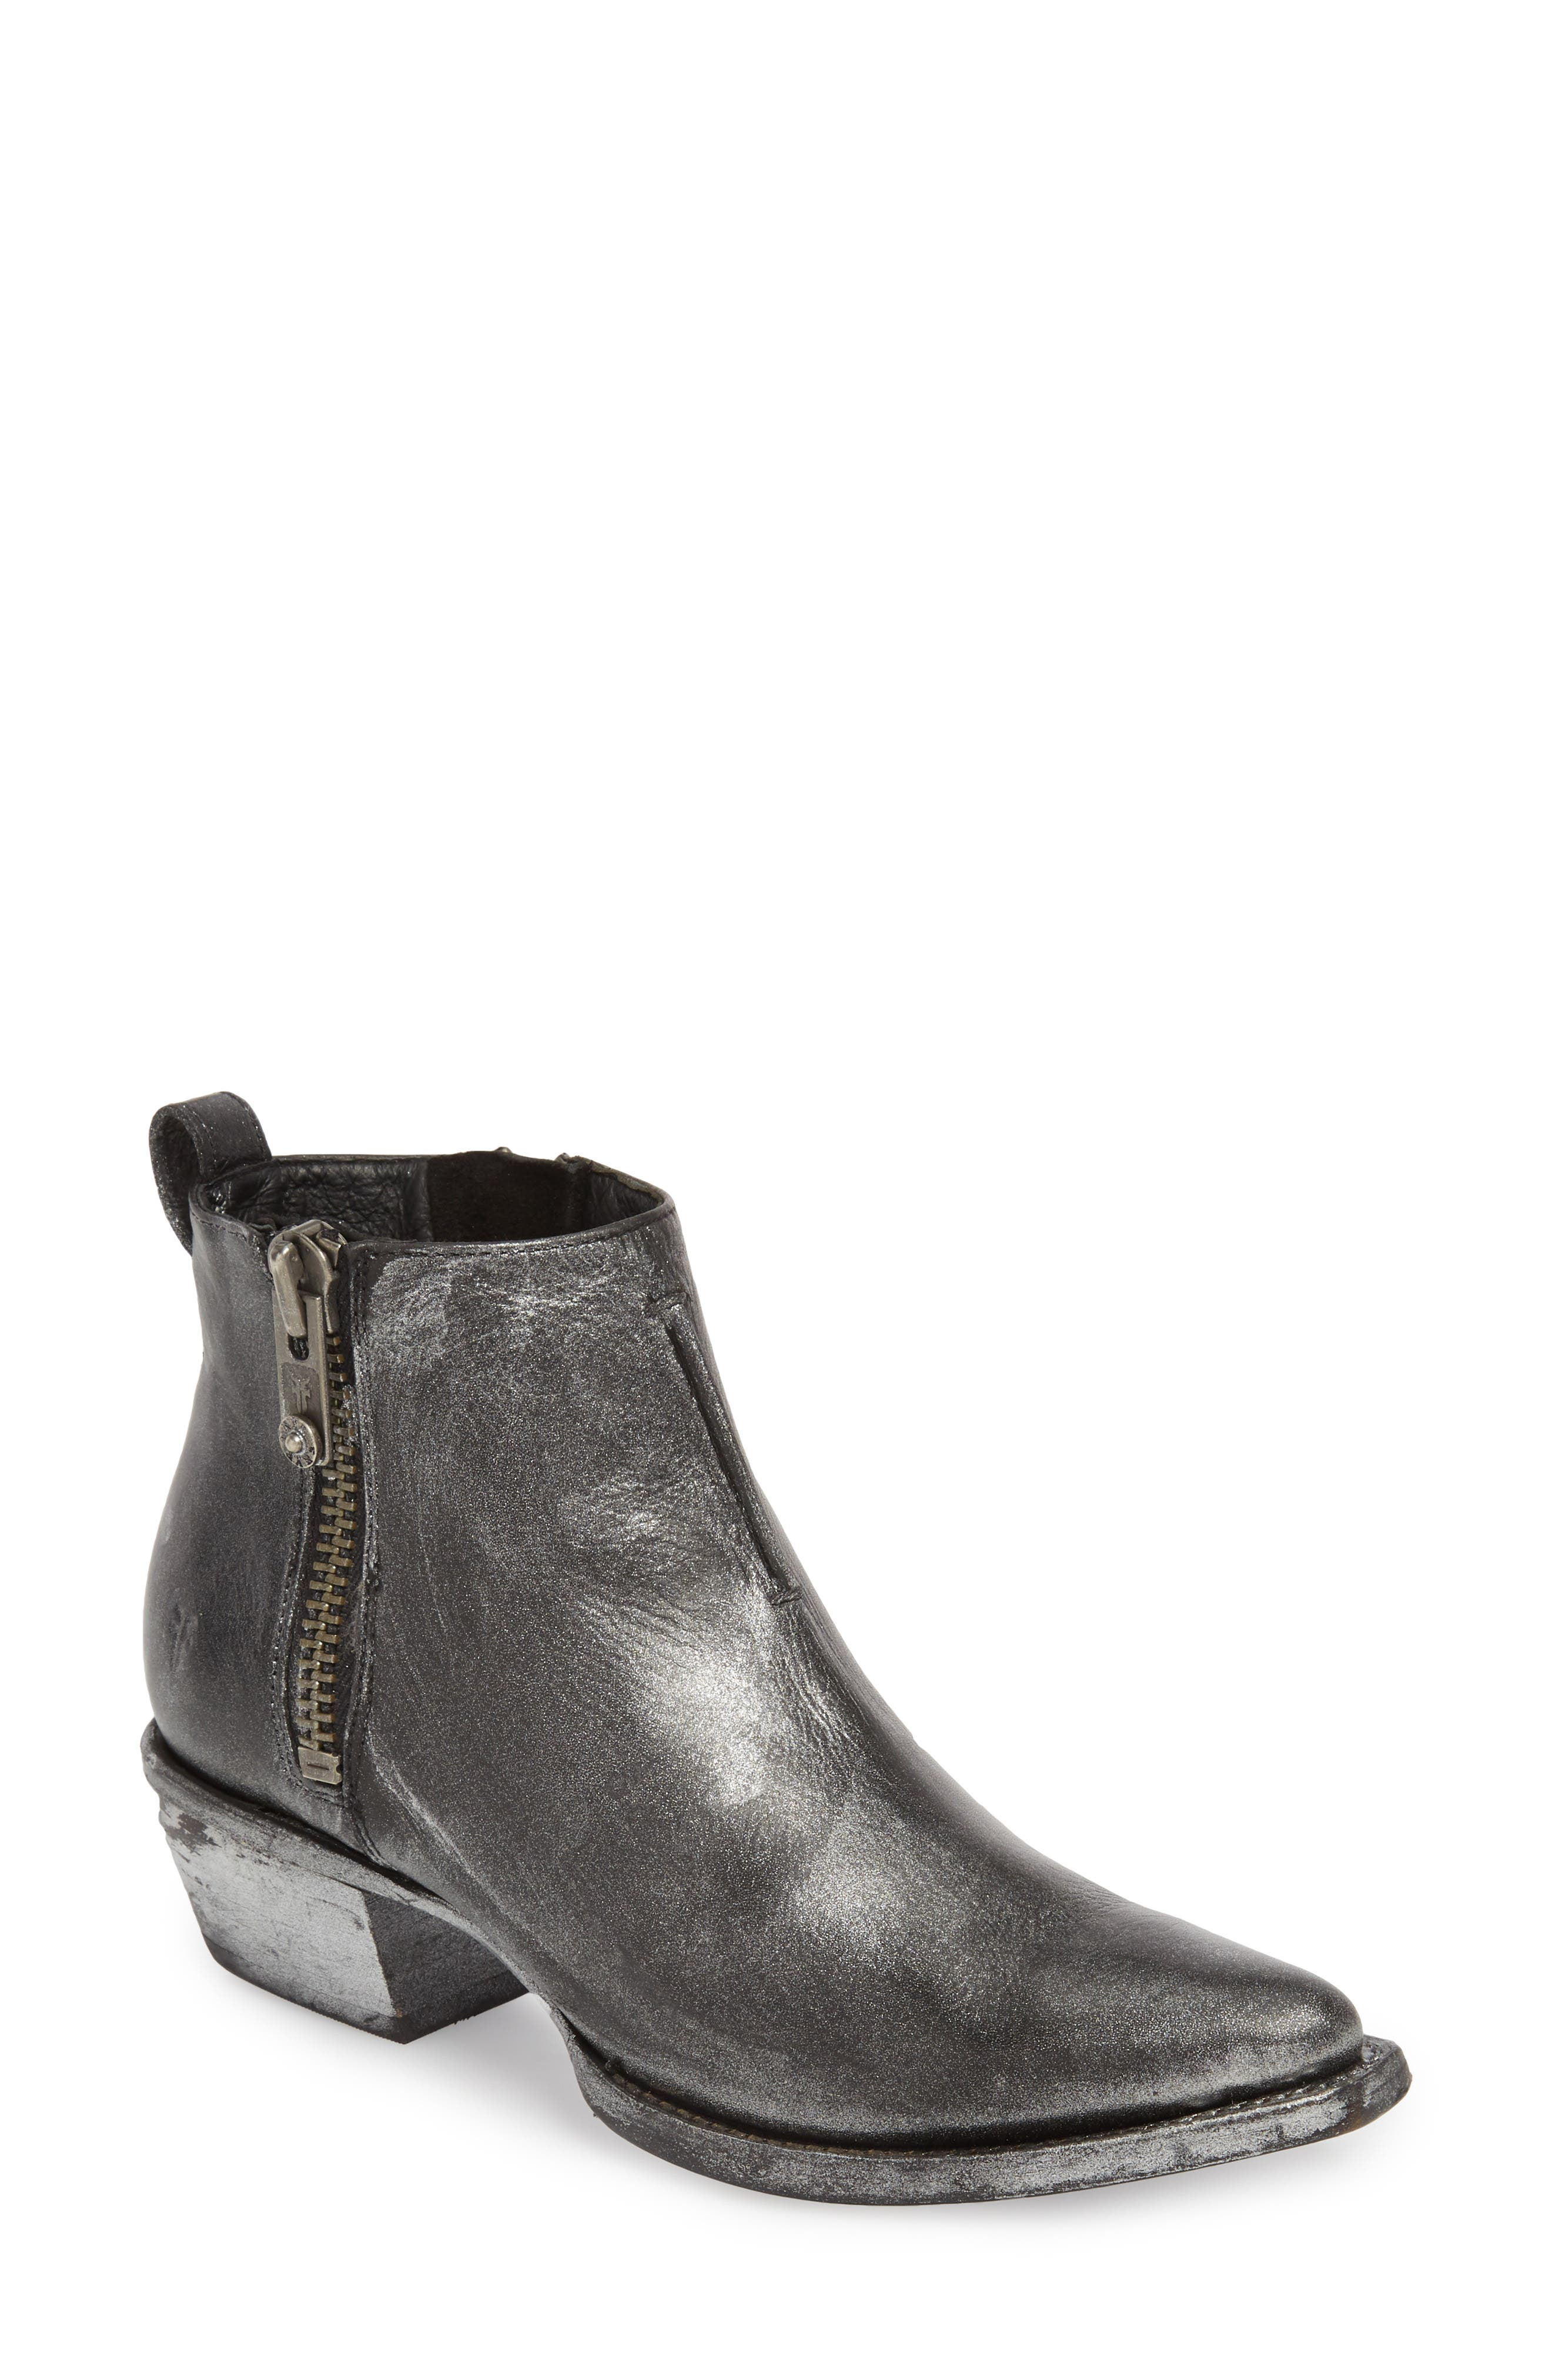 Sacha Moto Short Bootie,                             Main thumbnail 1, color,                             Black Metallic Leather